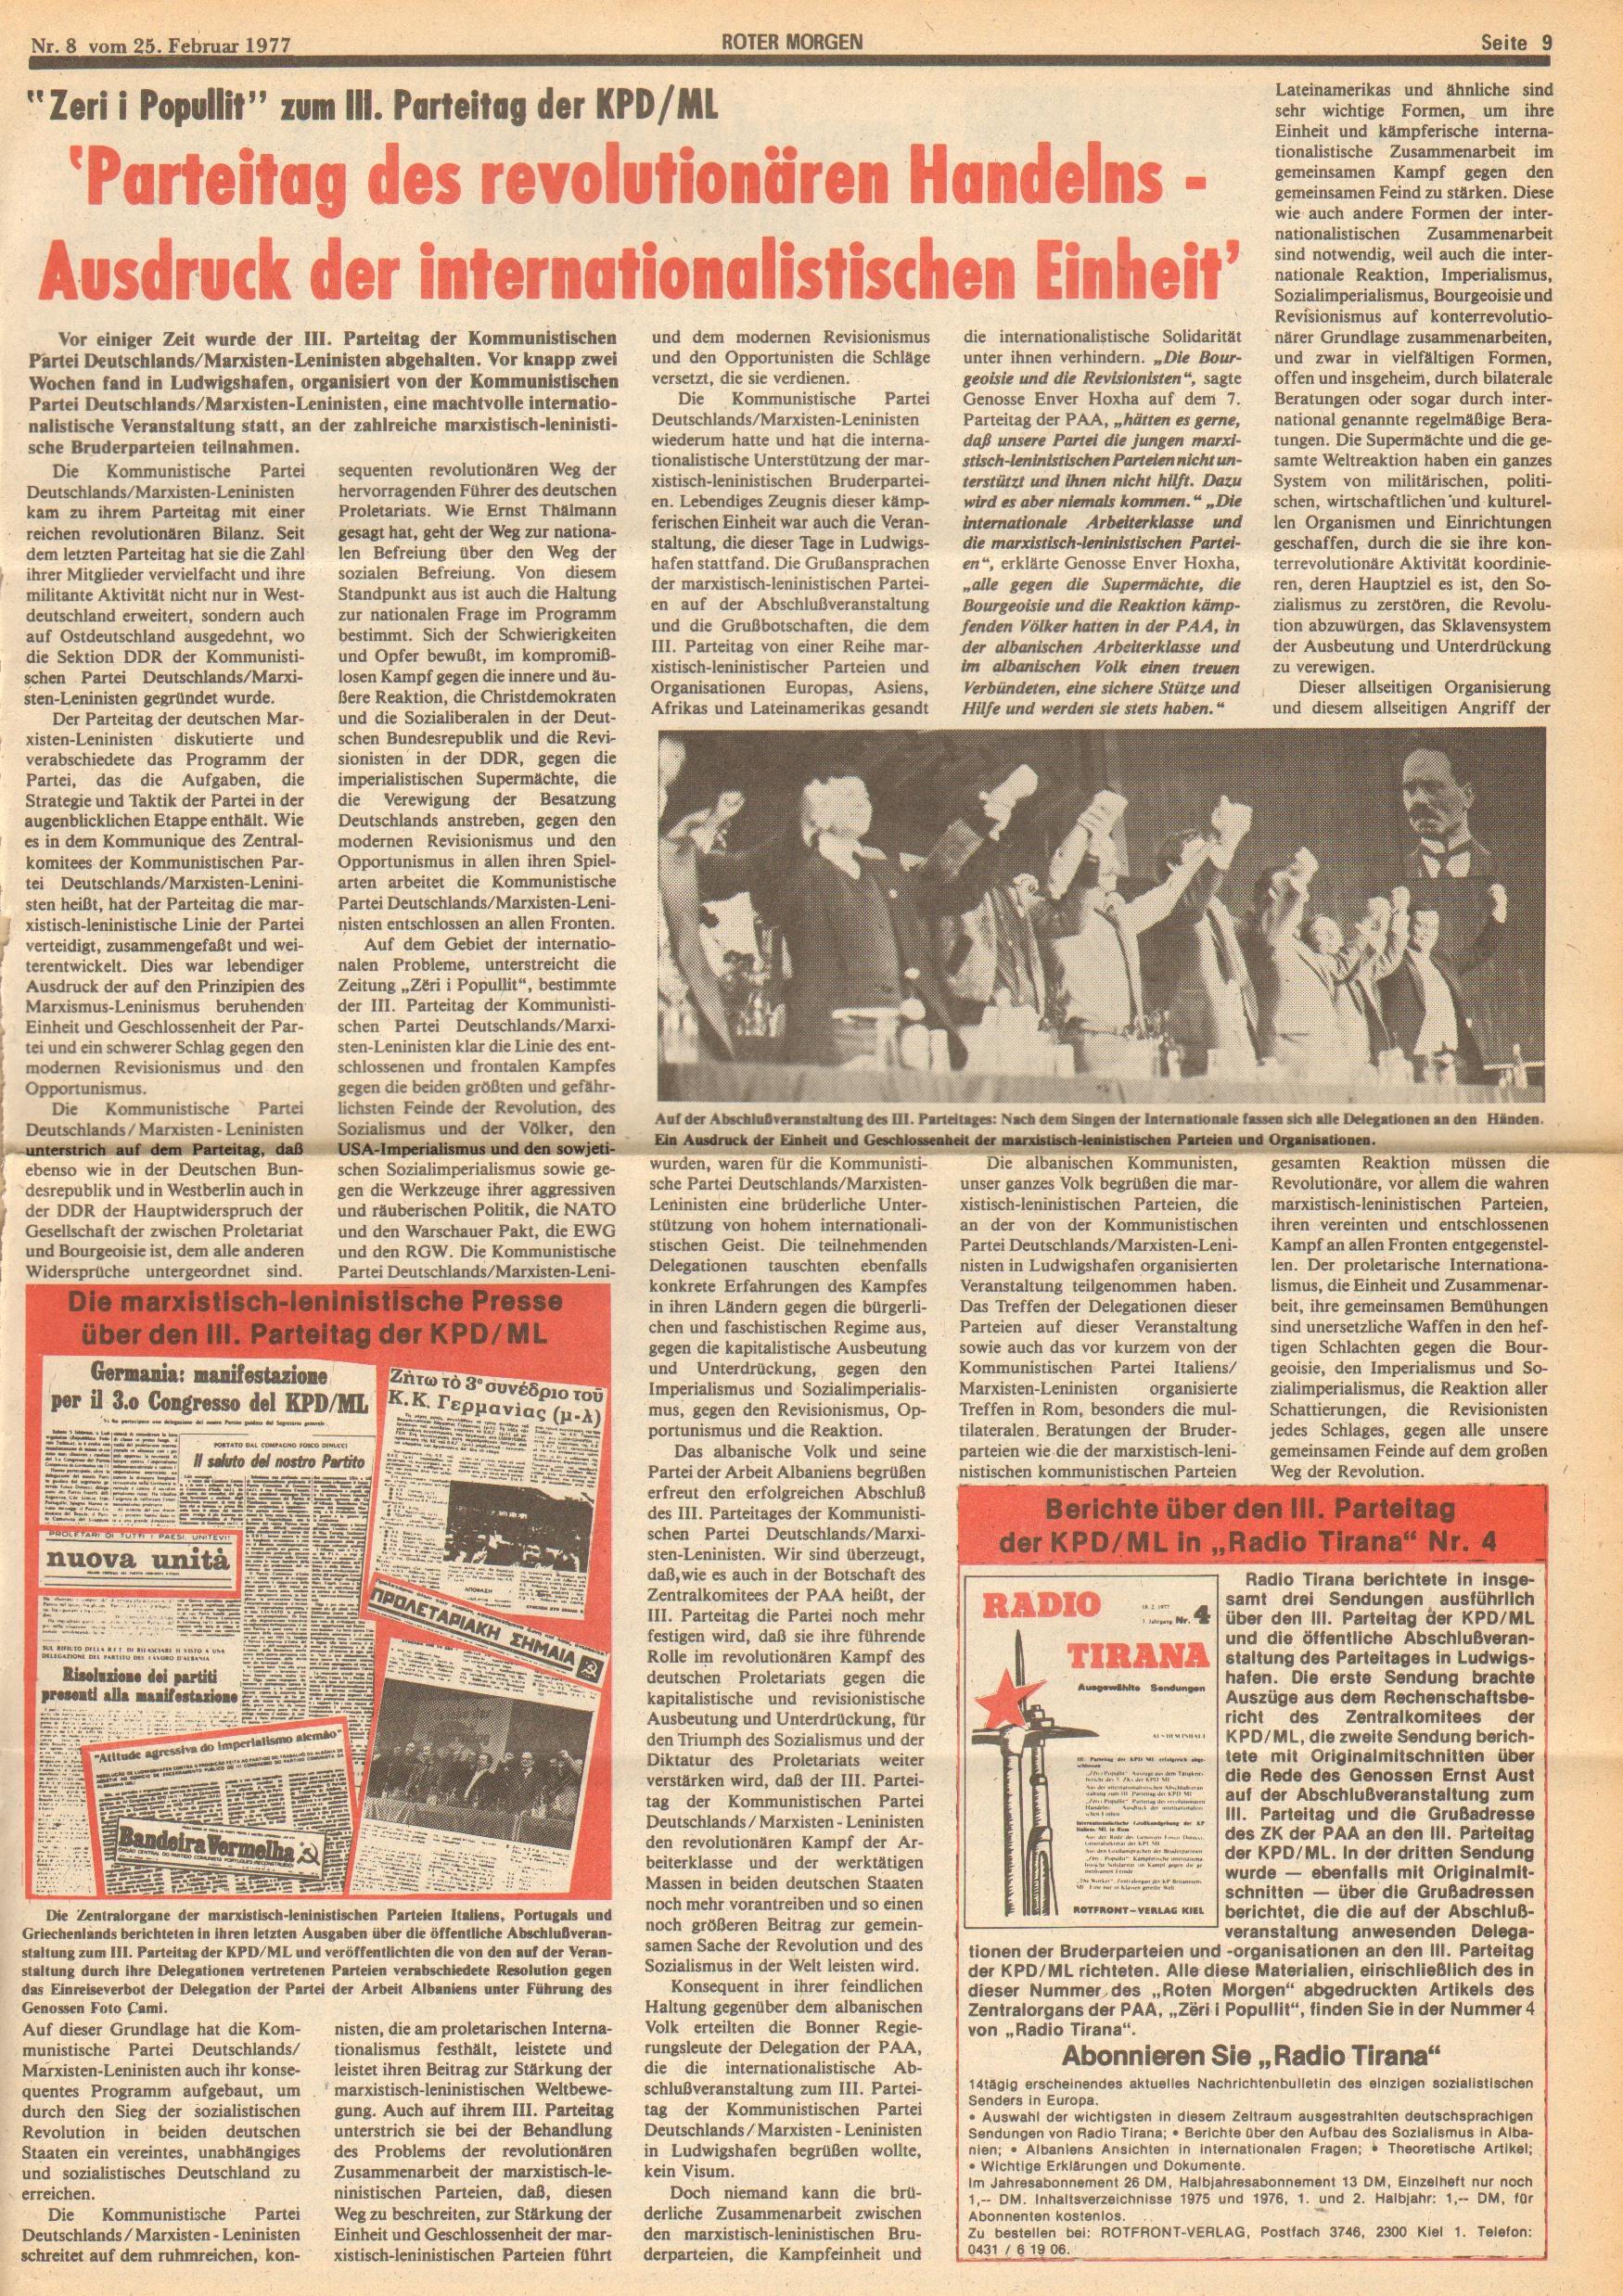 Roter Morgen, 11. Jg.,25. Februar 1977, Nr. 8, Seite 9